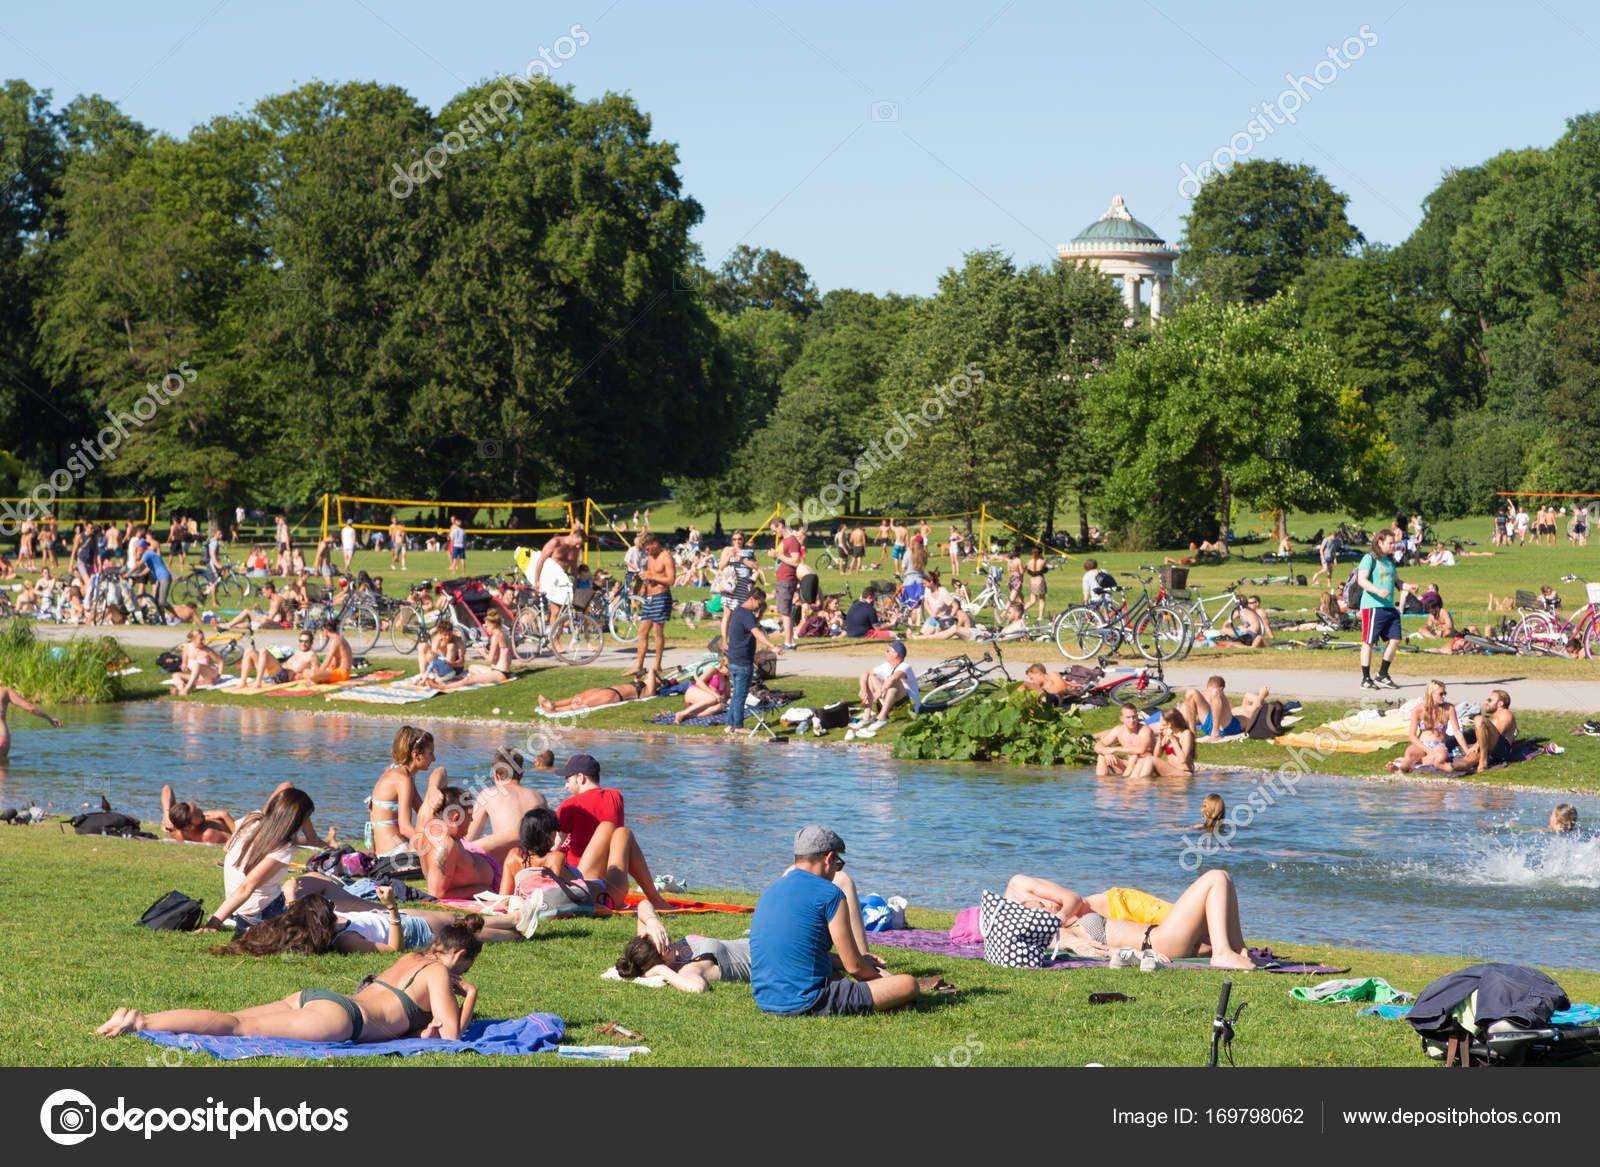 People Enjoying The Summer Day In Englischer Garten City Park In Park City Park City